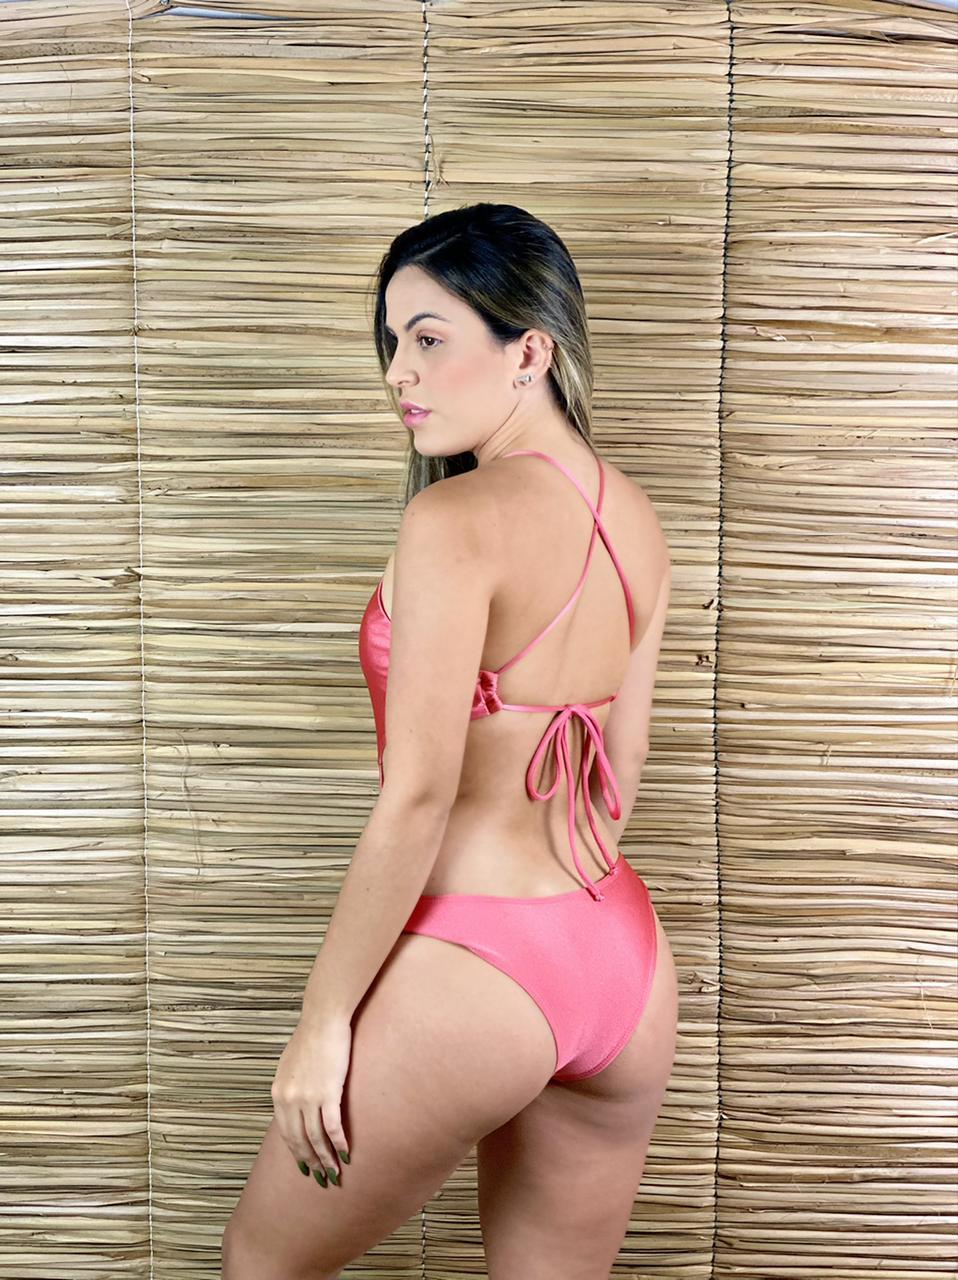 Maiô Body Decote Acessório Goiaba Metalizado  - RMCE BRAZIL